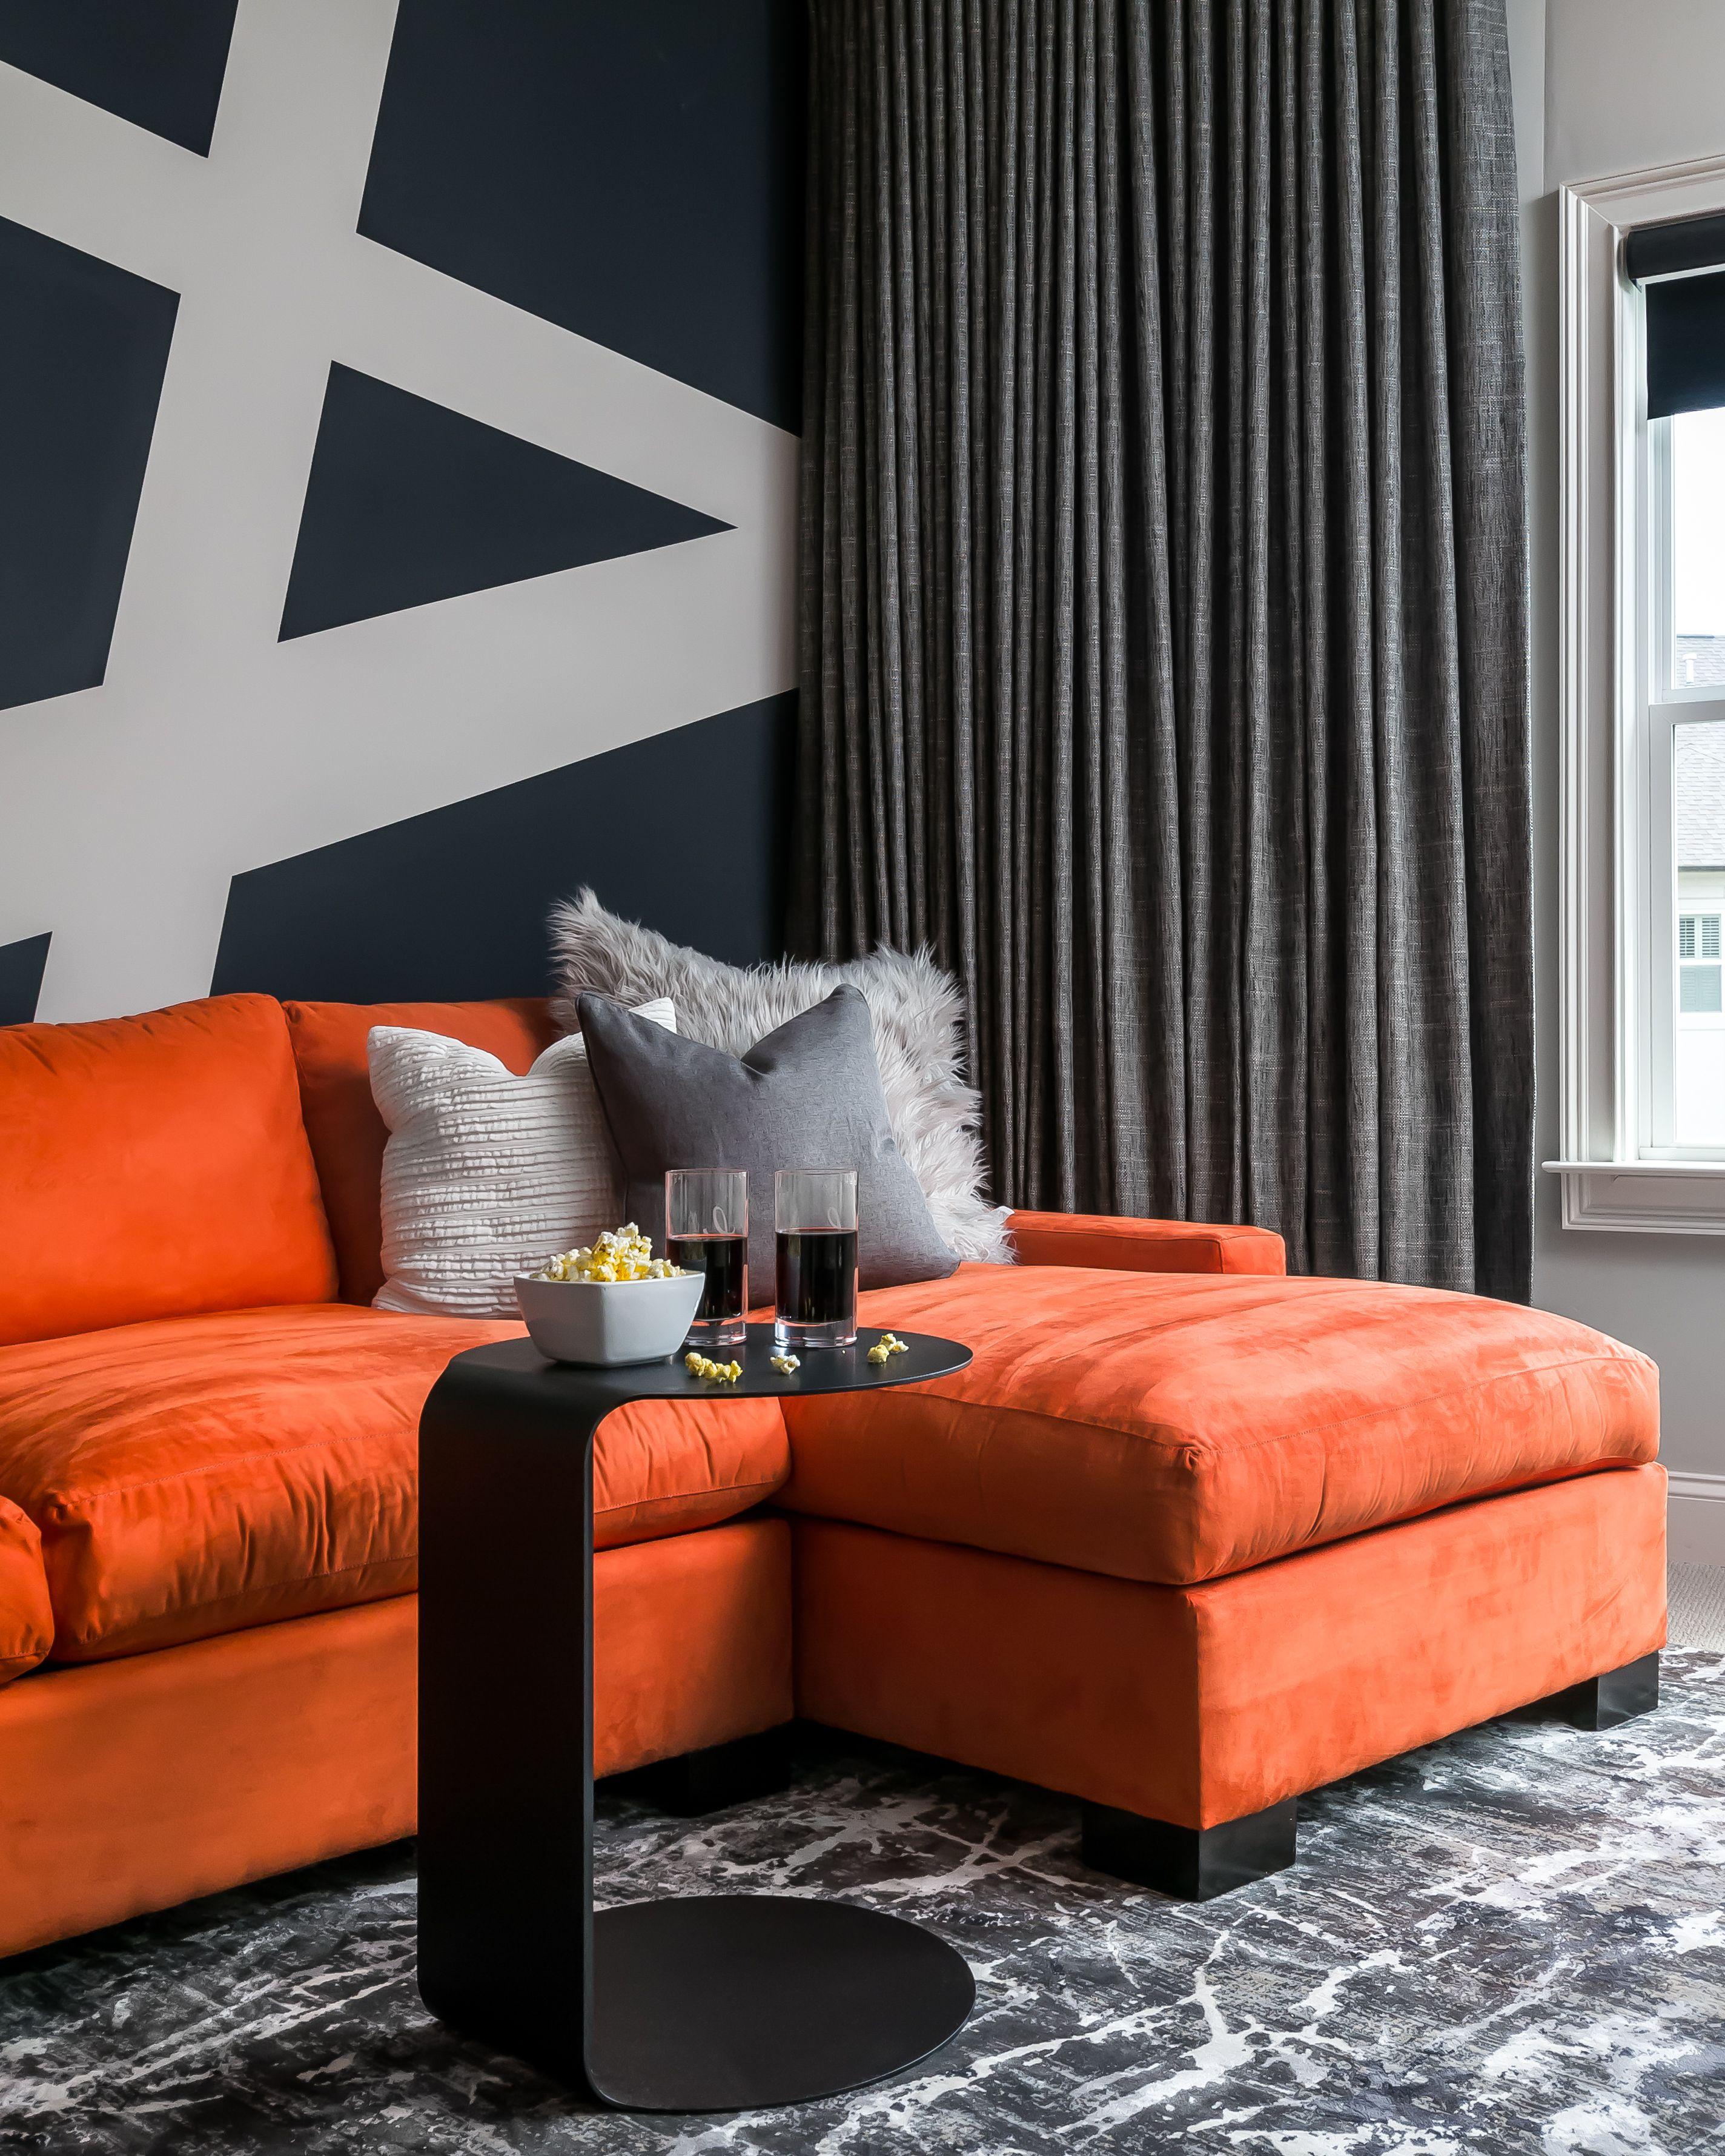 Best Orange Home Decor Tips How To, Burnt Orange Living Room Accessories